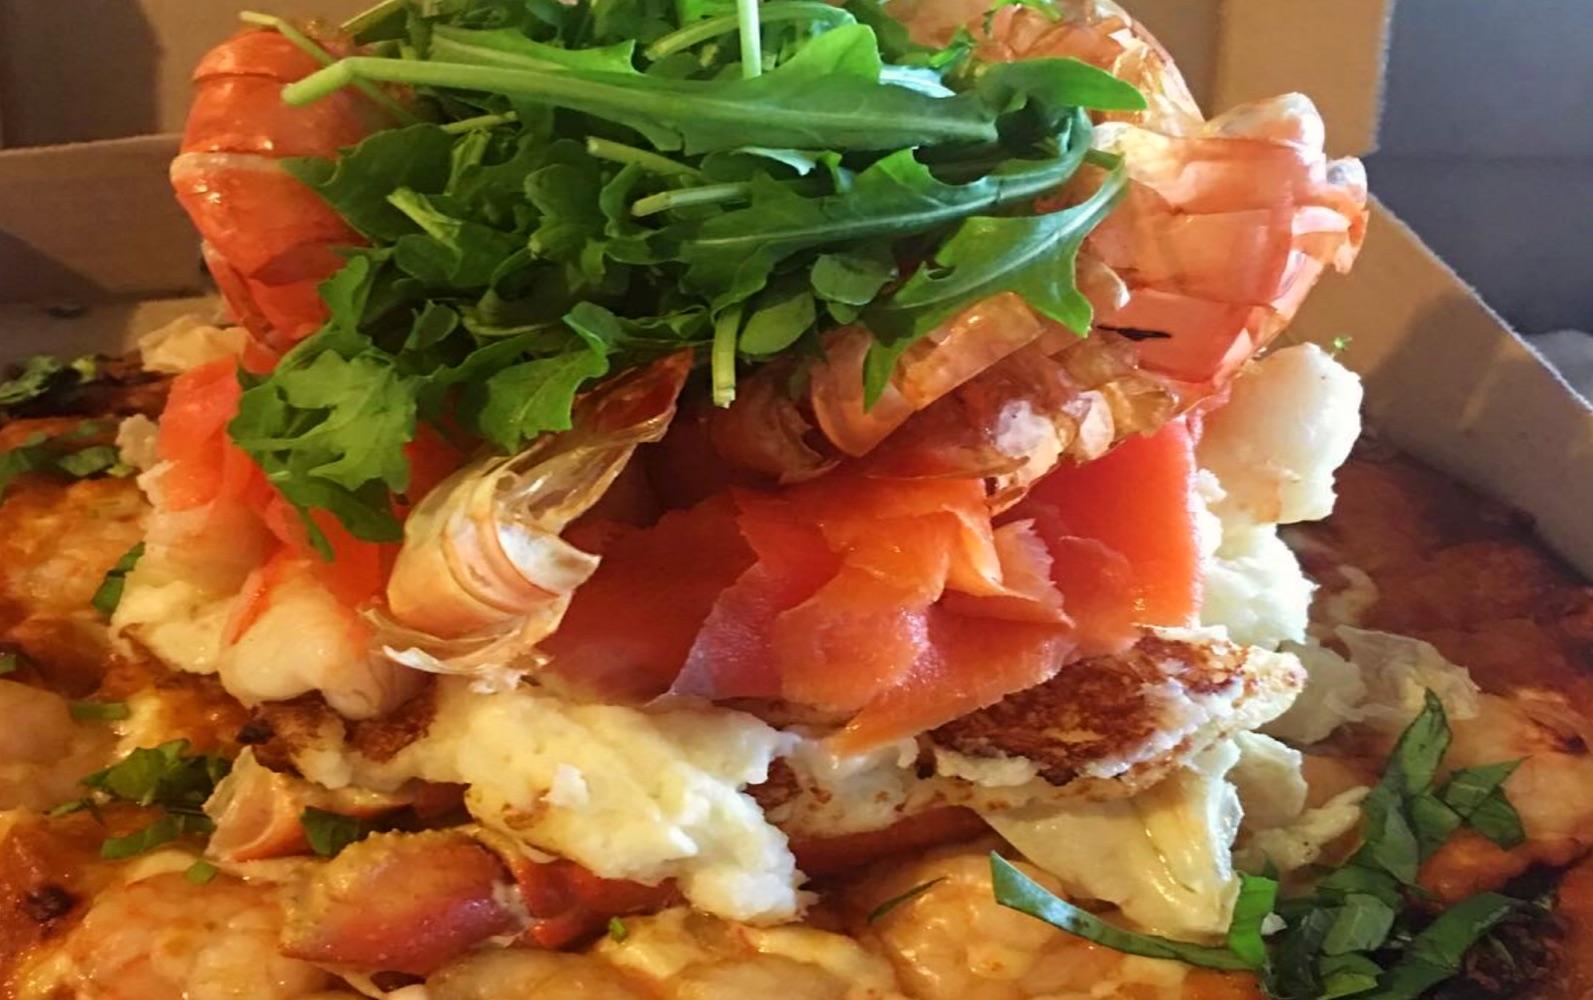 A seafood pizza at Steveston Pizza Company, Steveston BC